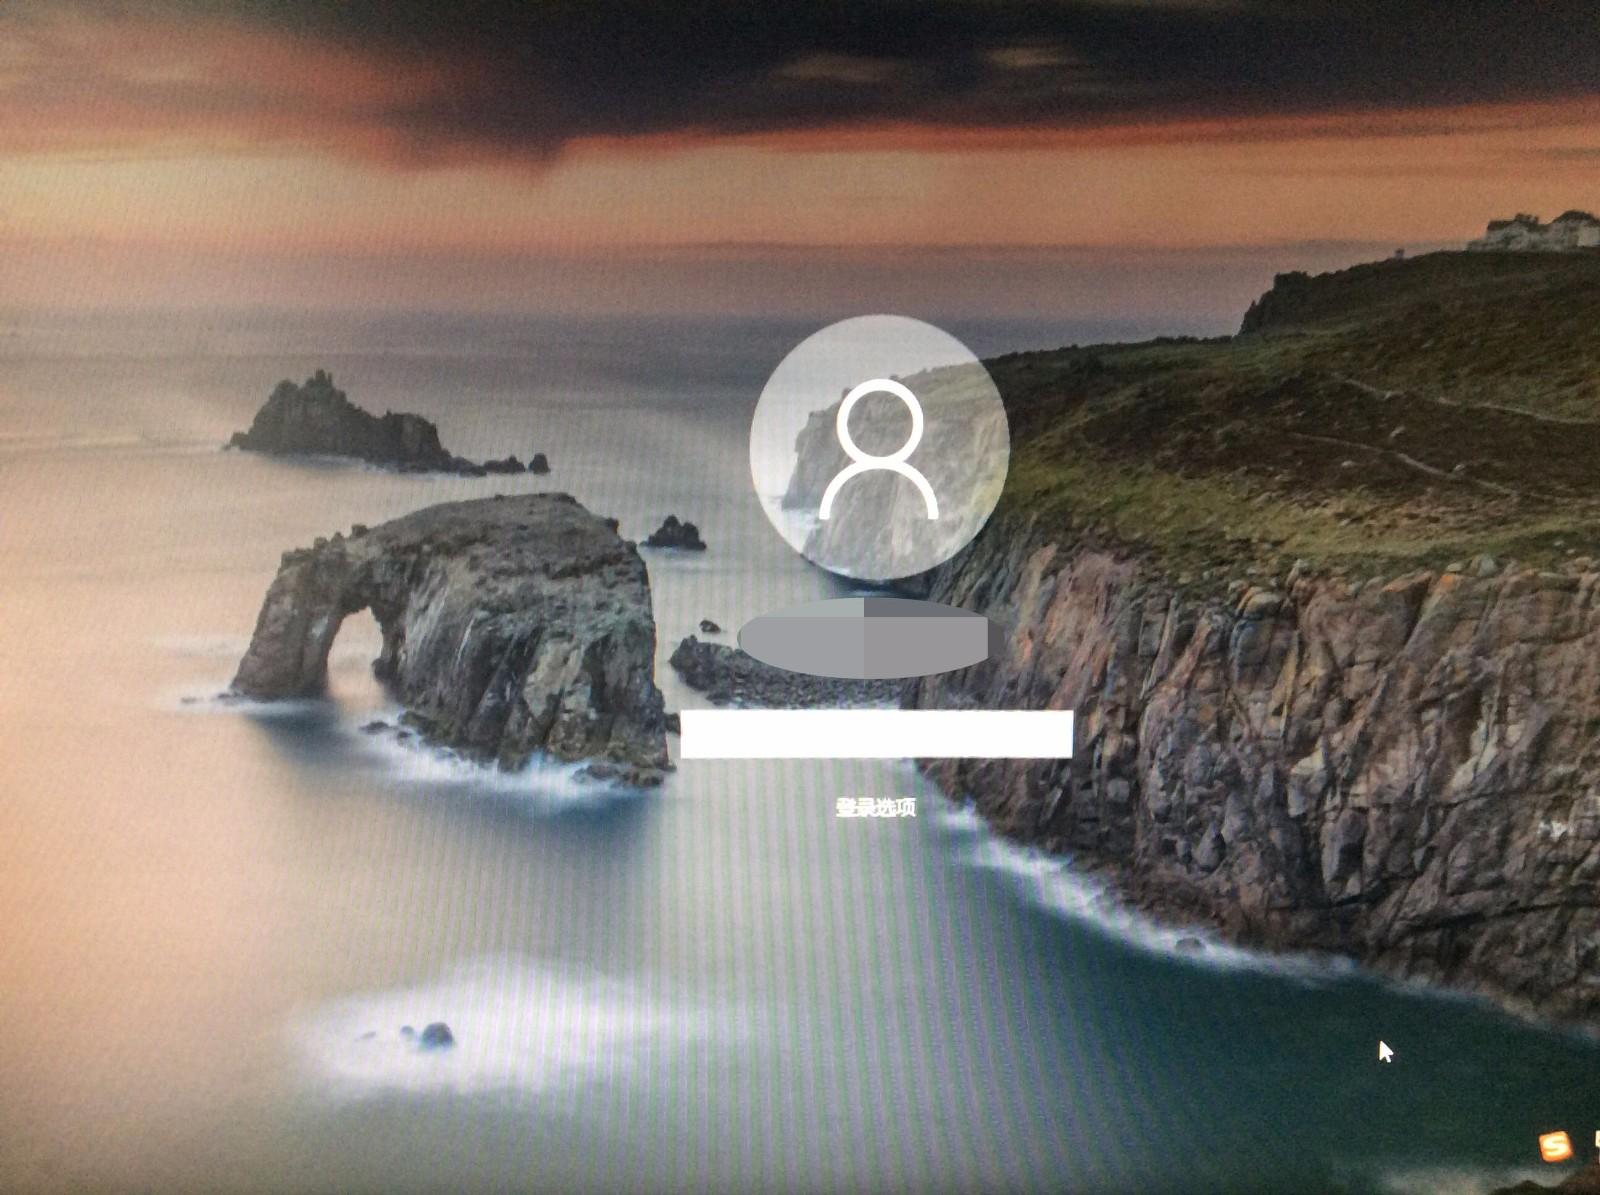 win10(一周年最新版)锁屏界面黑屏 用的是windows聚焦√ 但是点击一图片